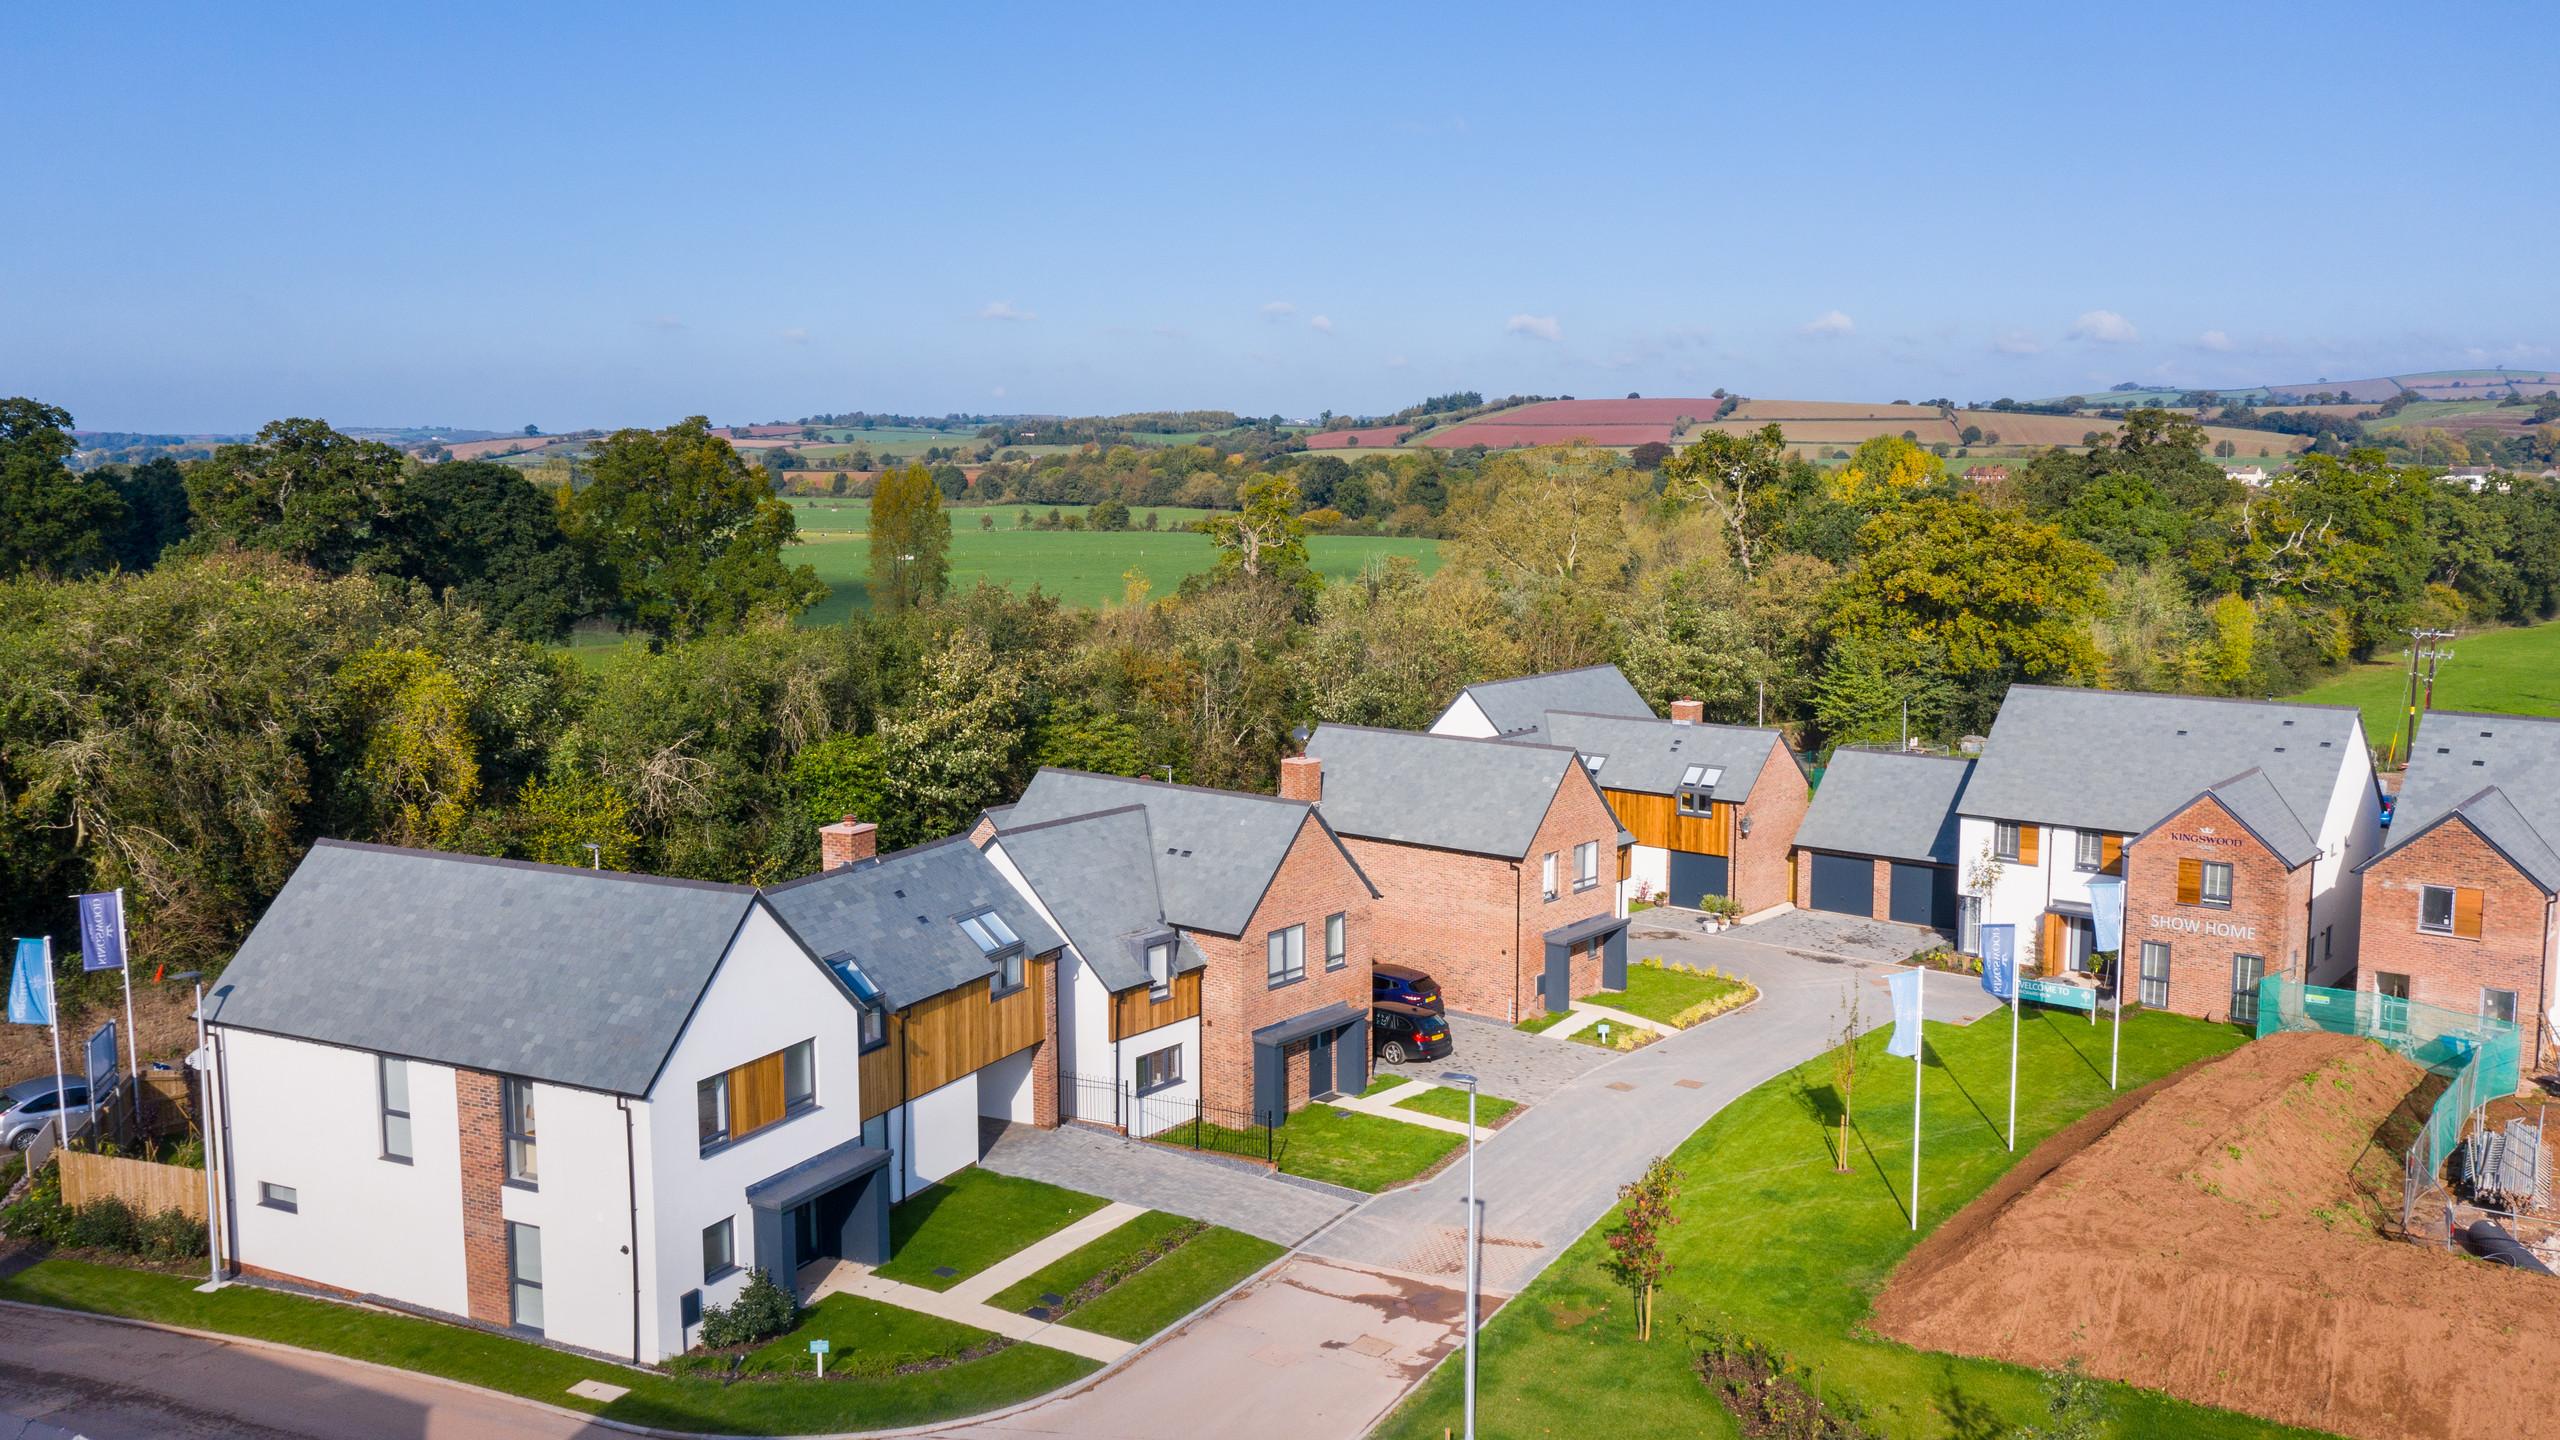 Aerial Photography - Housing development, Exeter, Devon